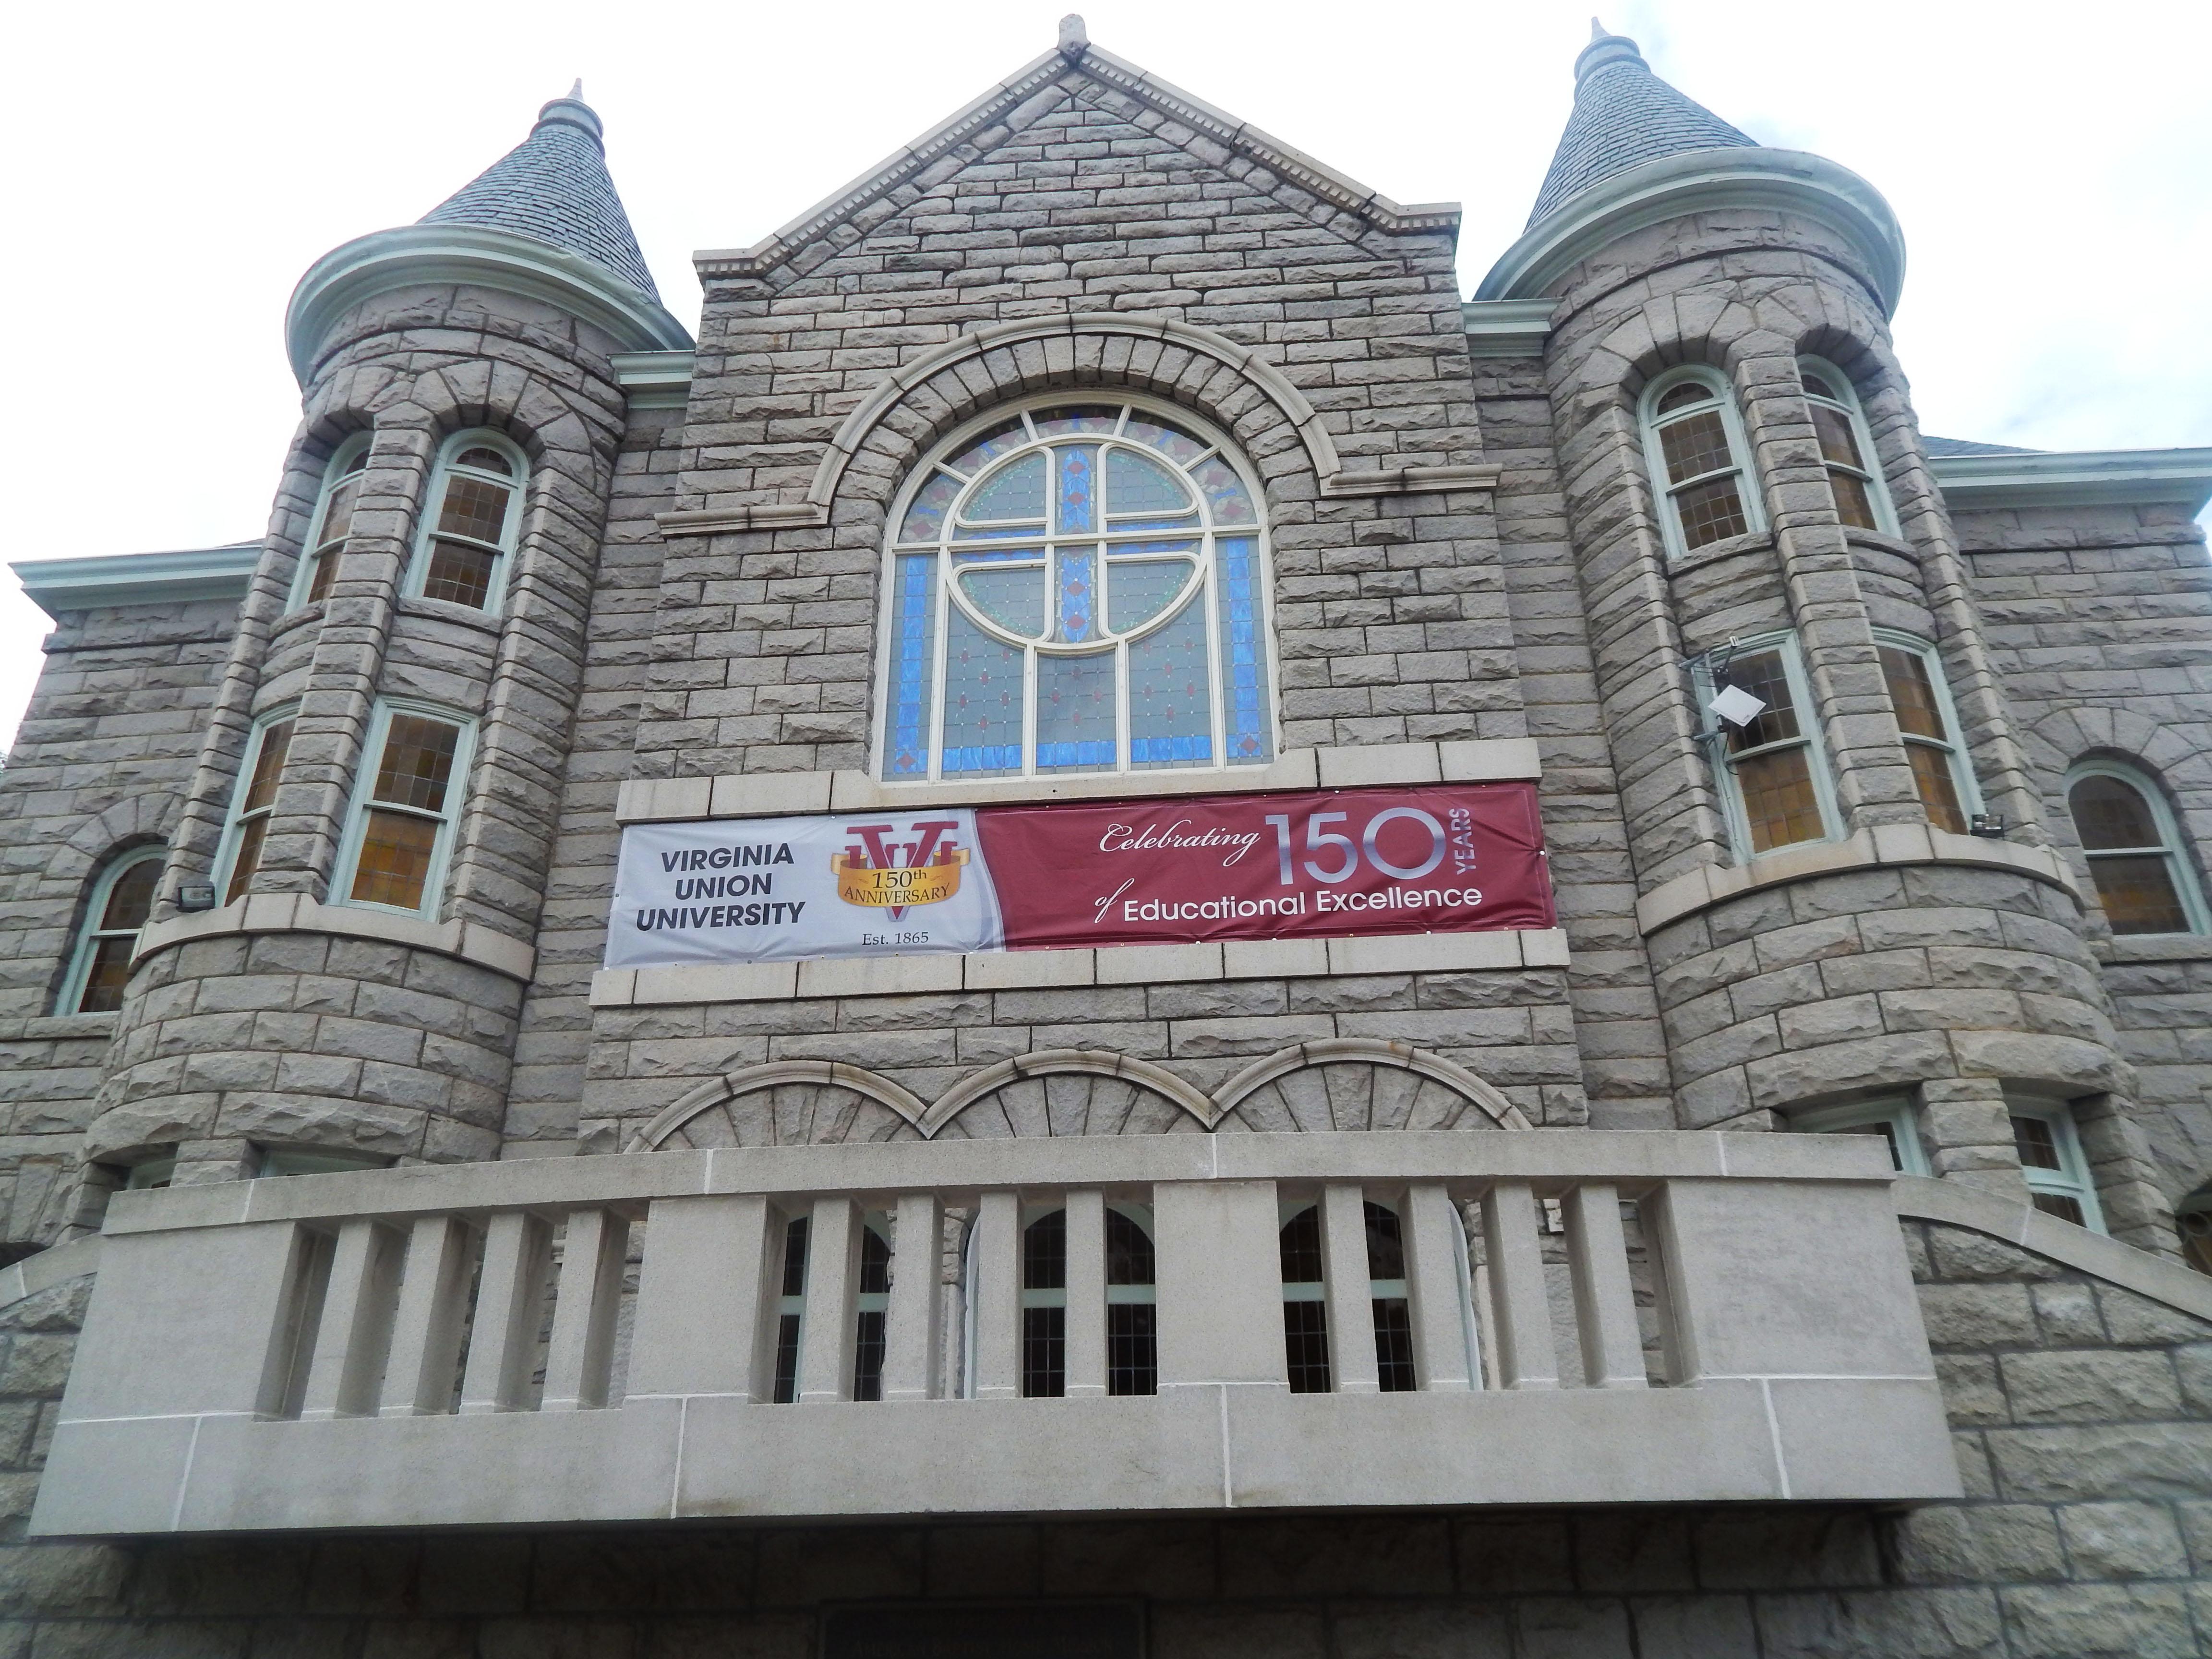 virginia union university s history runs deep worth higgins